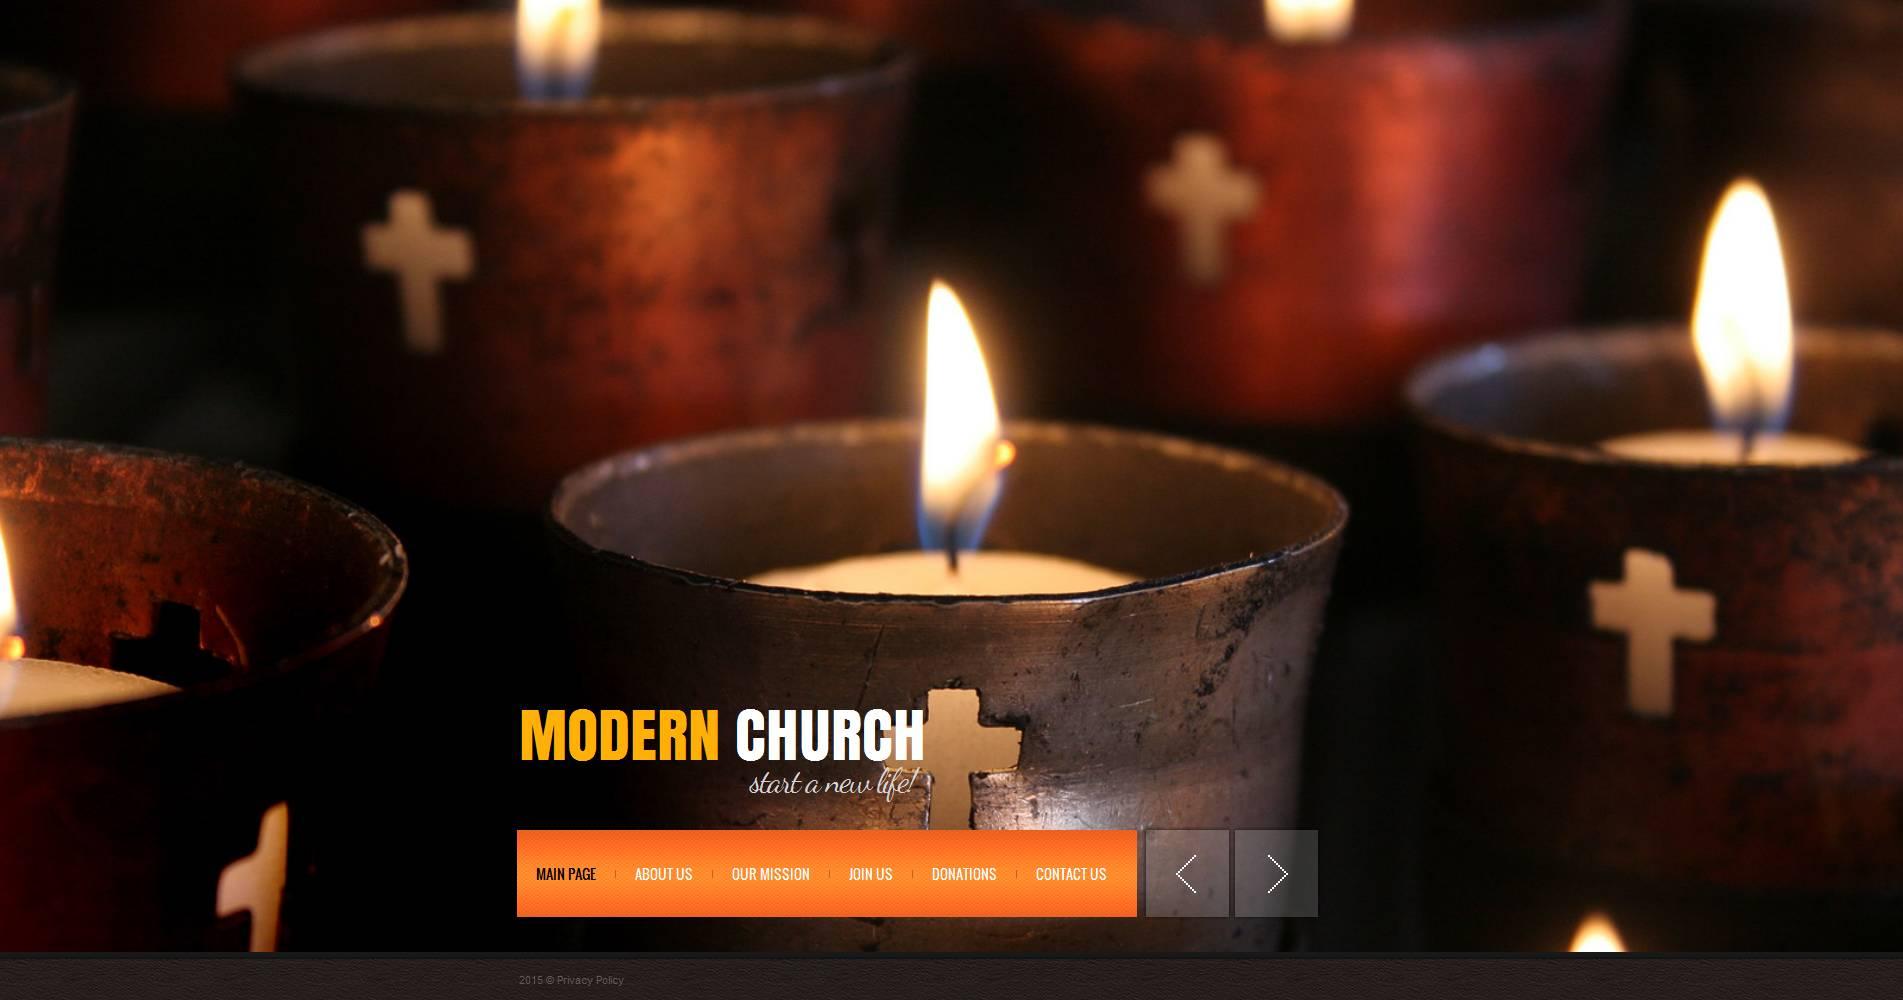 Premium Moto CMS HTML Template over Godsdienstige №53620